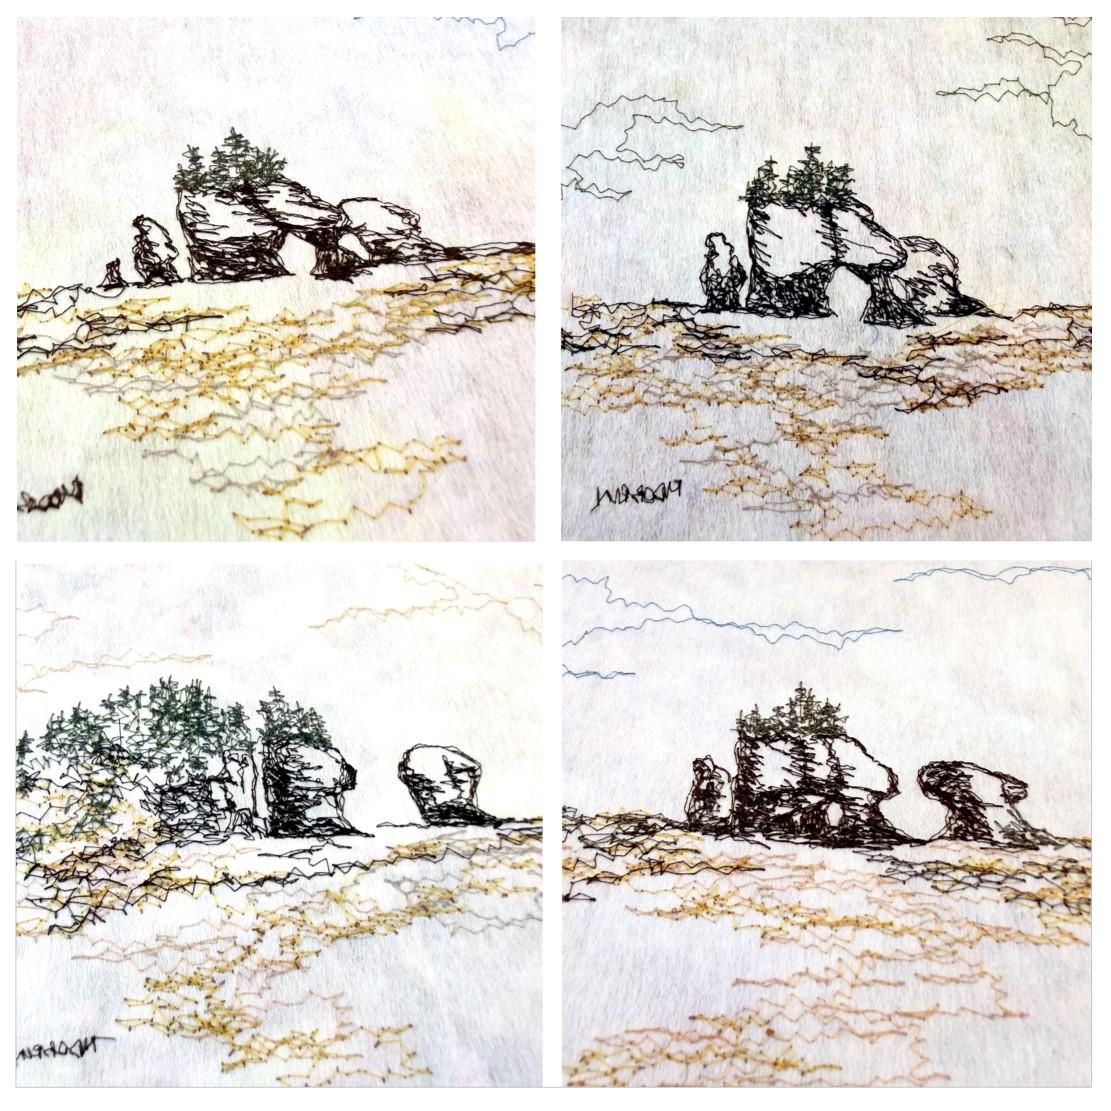 Stitched backs - Hopewell Rocks